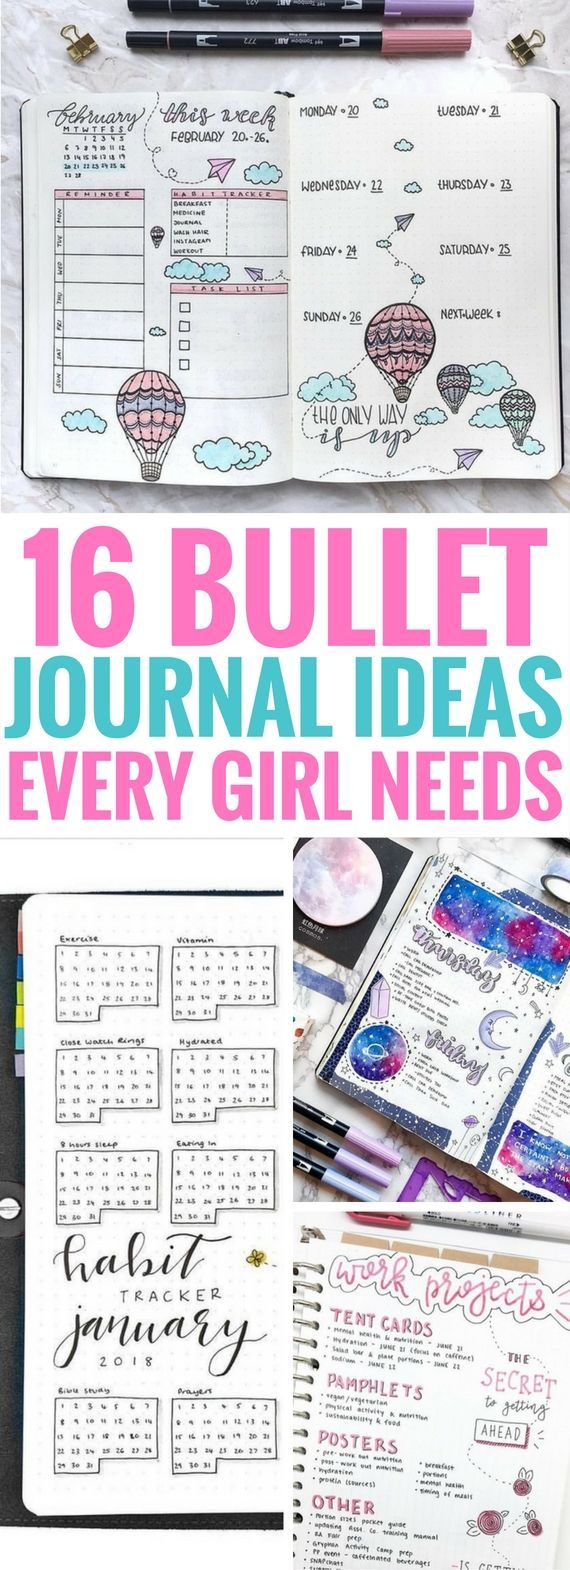 16 Best Bullet Journal Ideas Every Girl Needs Sarah Skrzetuszewsky DIY und Kunsthandwerk